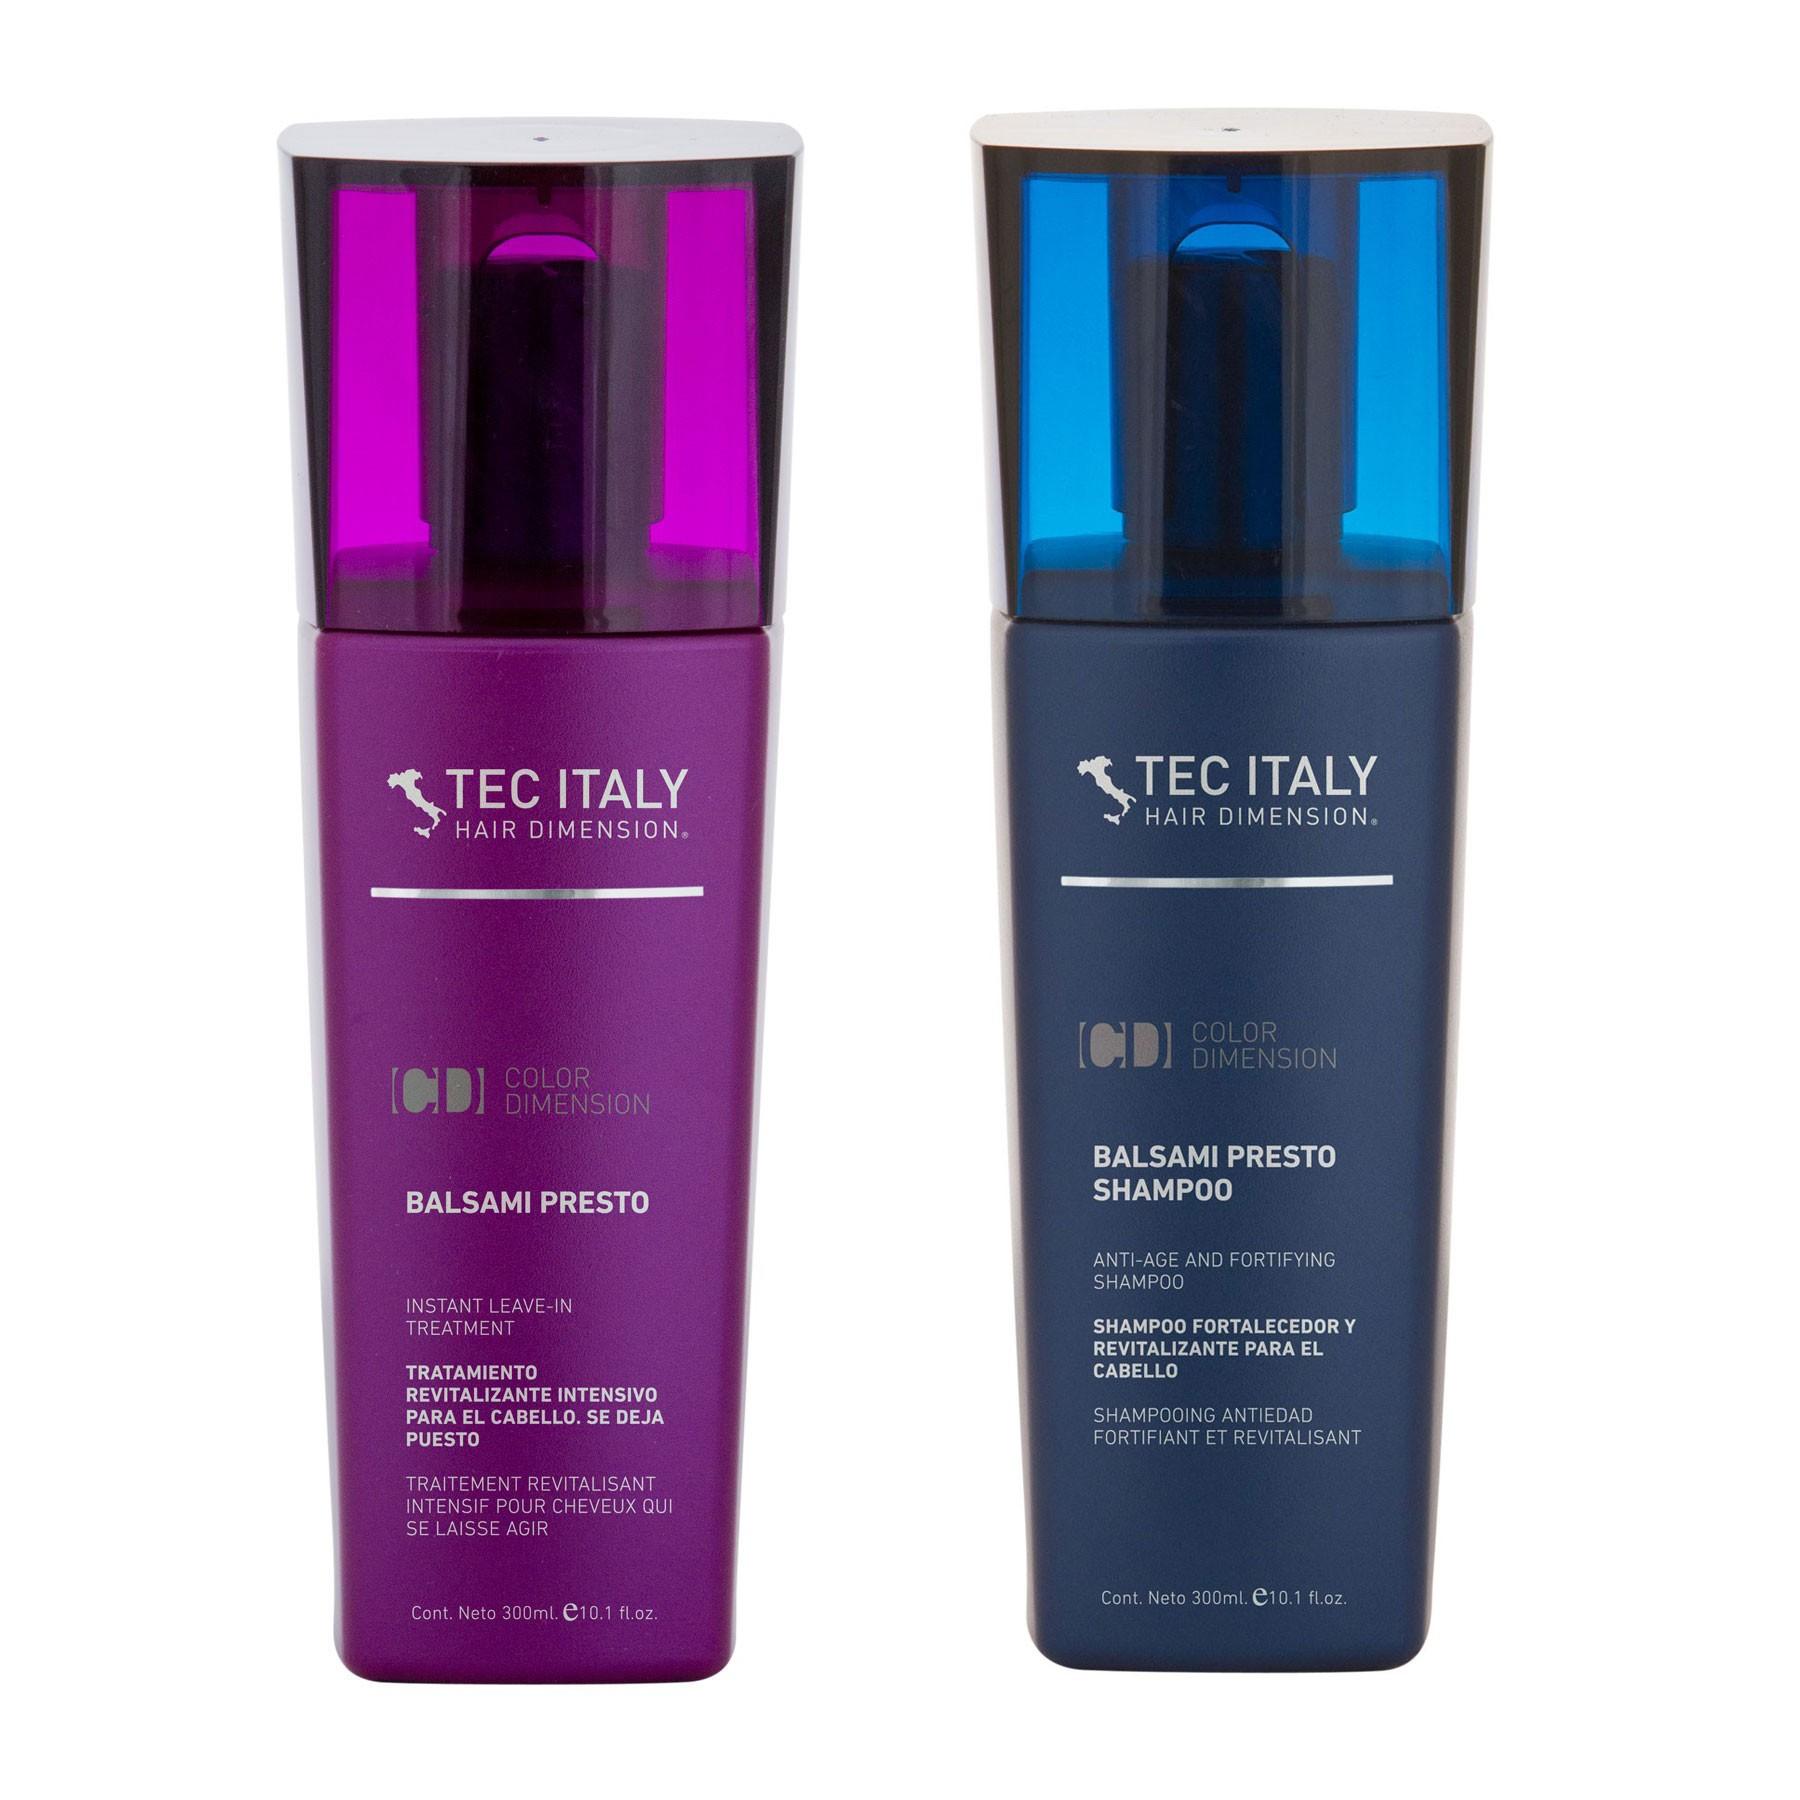 Kit Fortalecedor / Revitalizador Shampoo - Tratamiento Balsami Presto Tec Italy